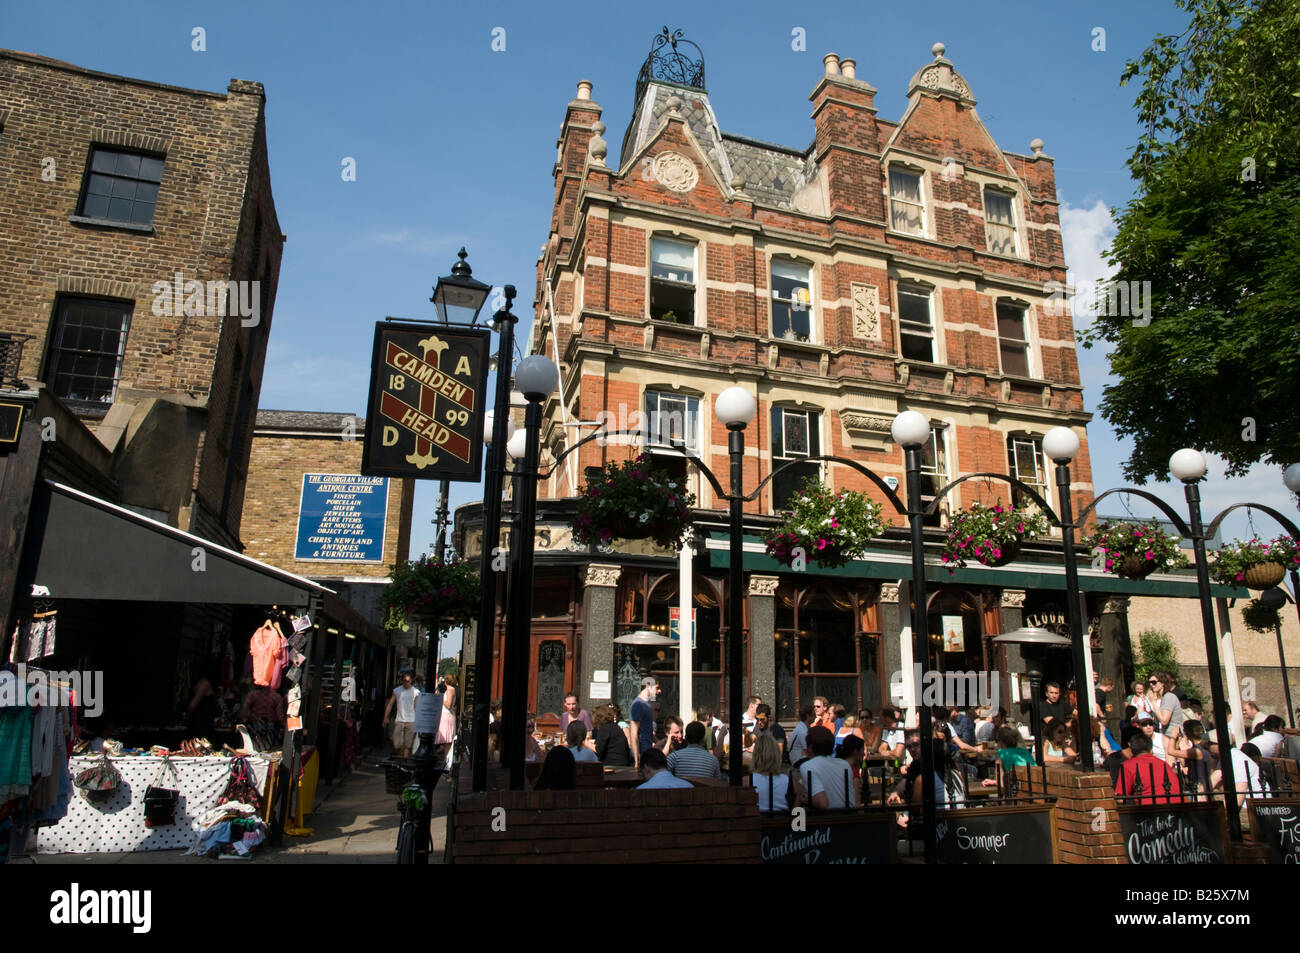 The camden head pub in camden passage islington london for The camden